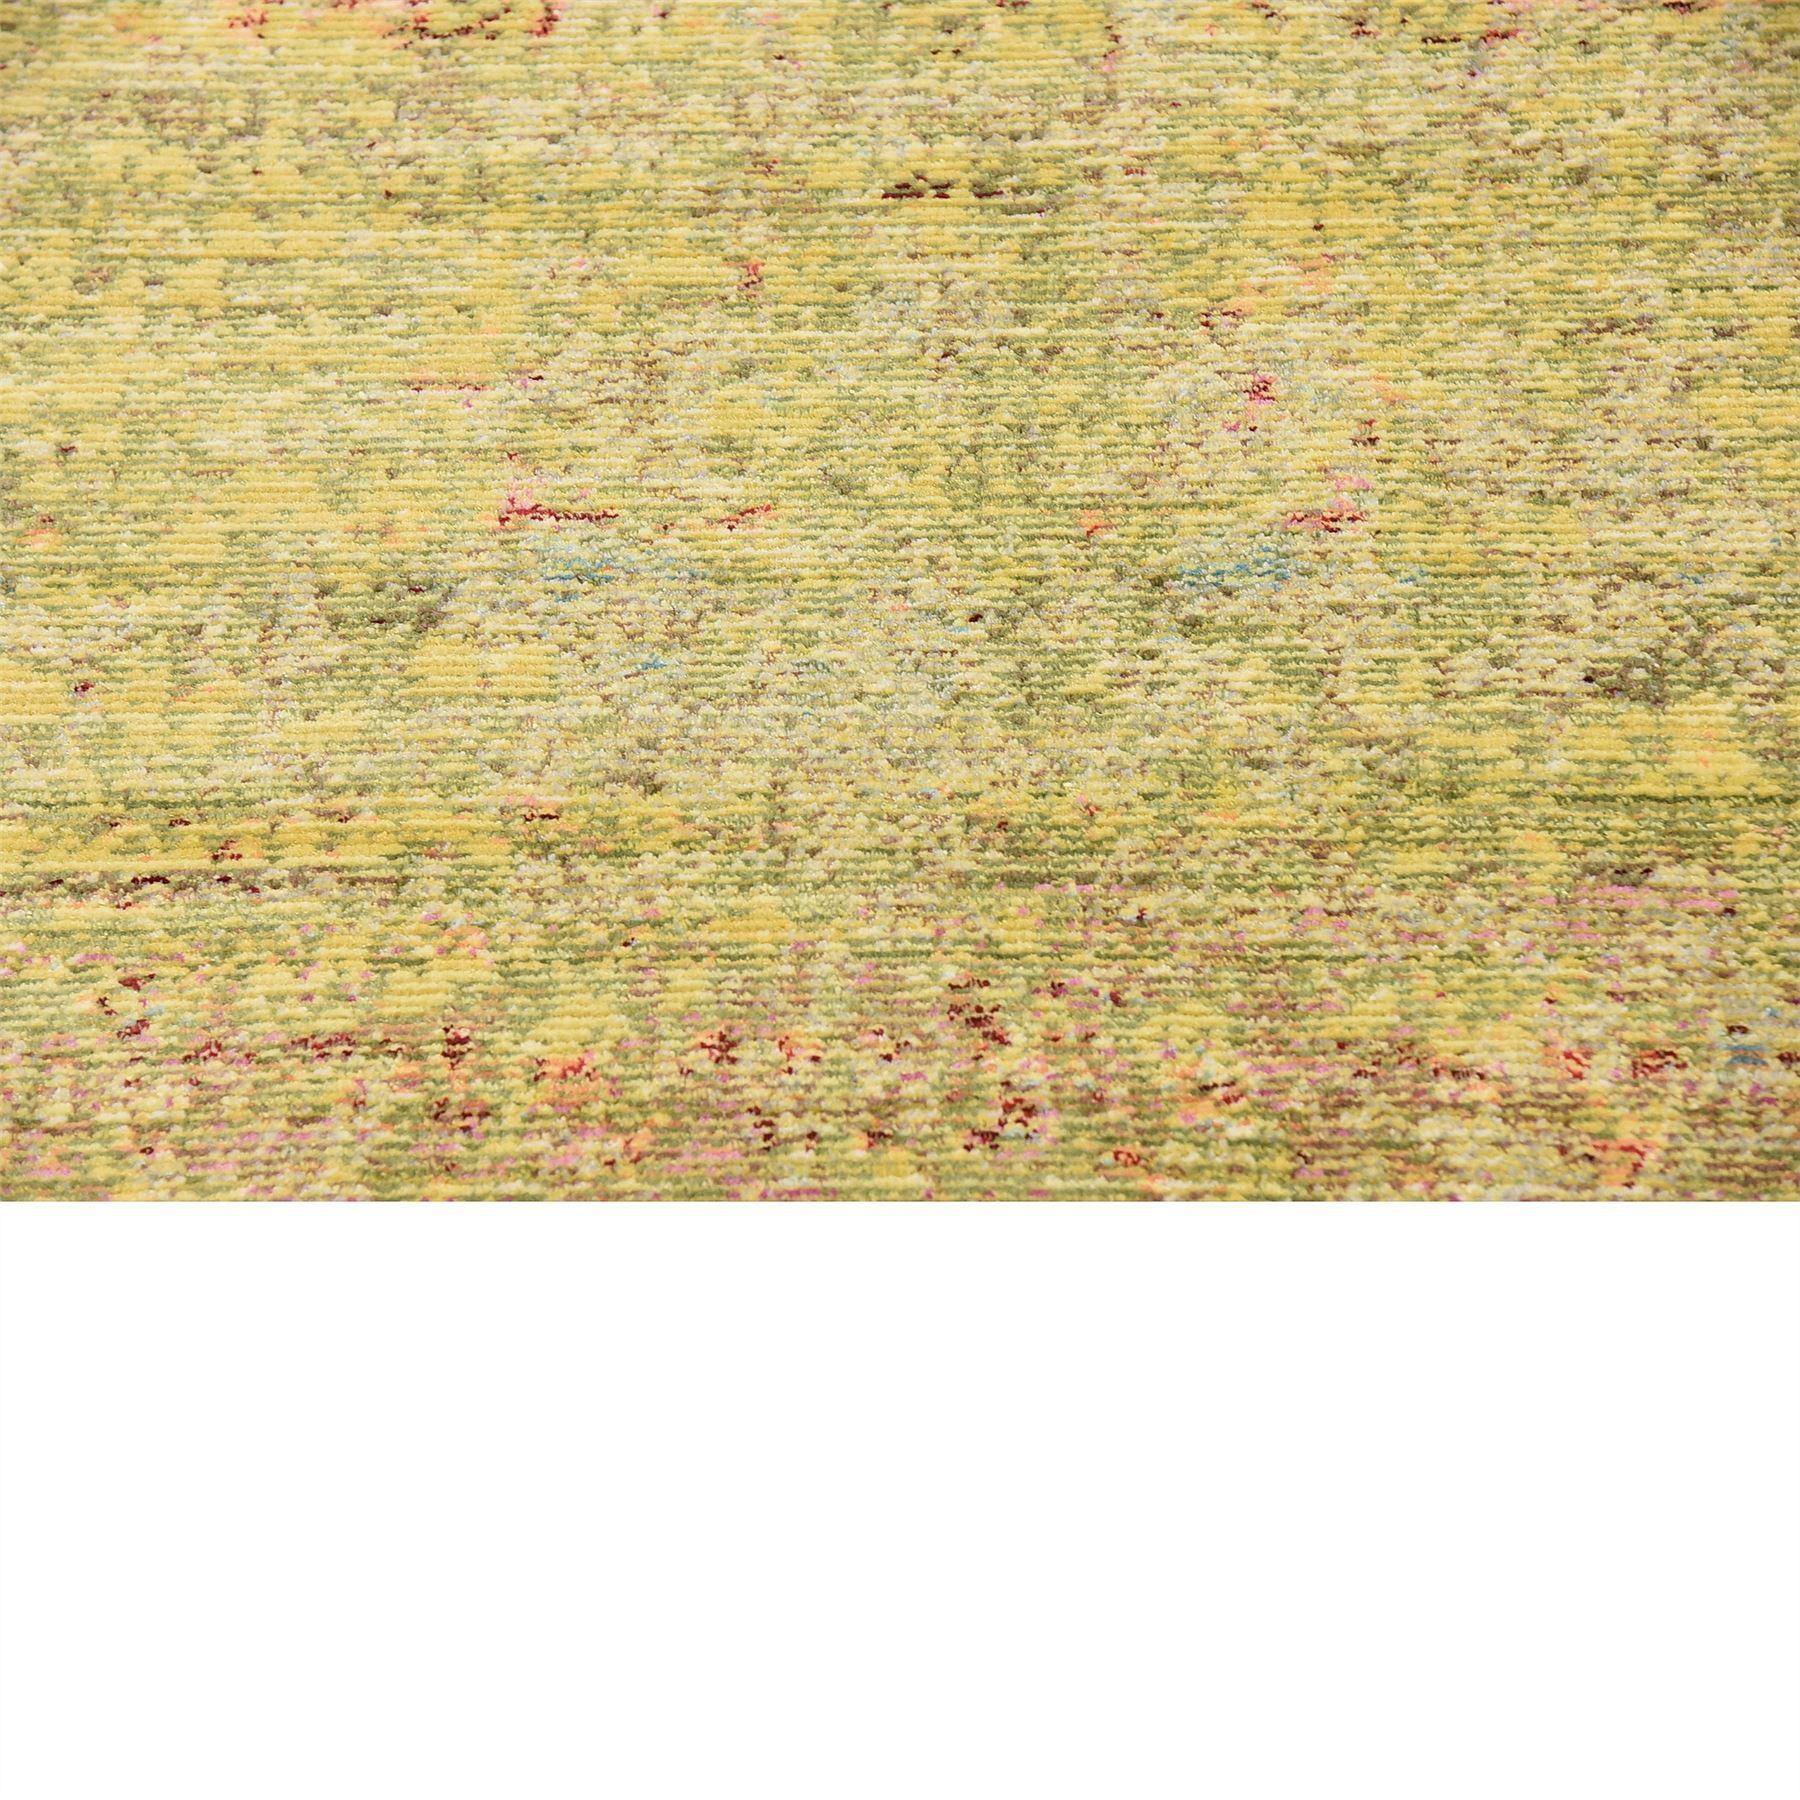 Modern Floor Area Rugs Contemporary Carpet 100 Cotton